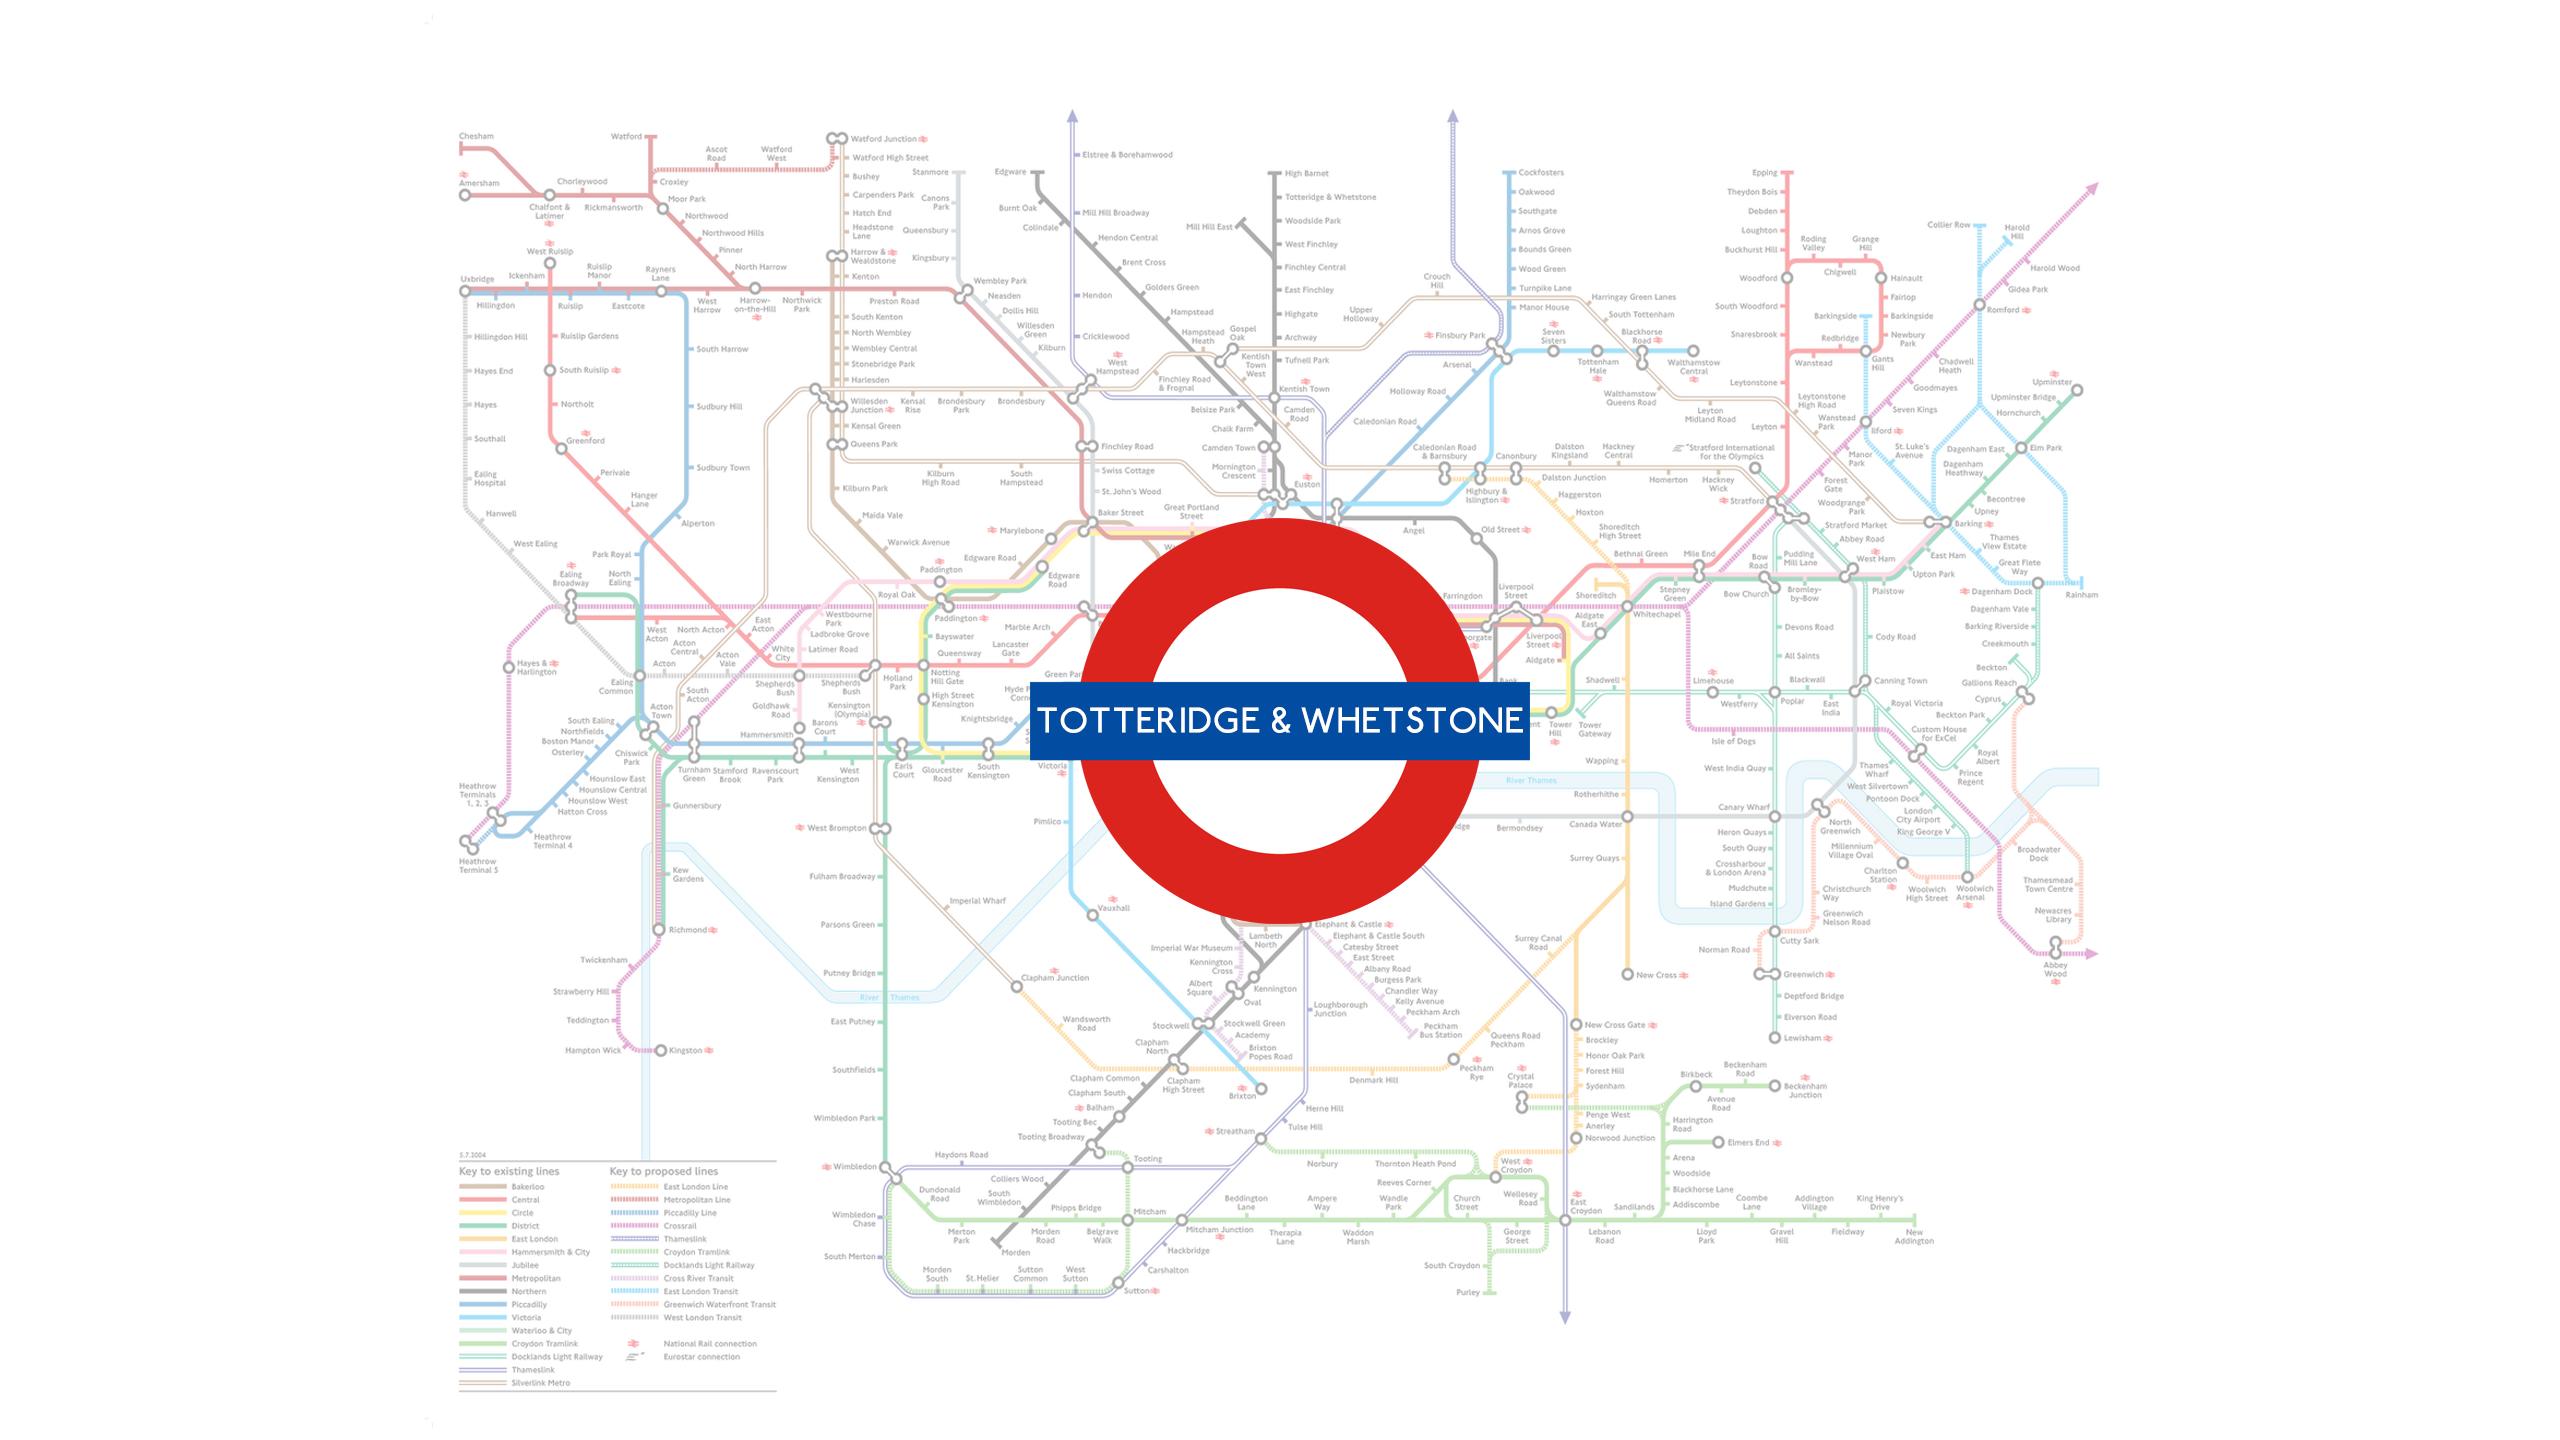 Totteridge & Whetstone (Map)